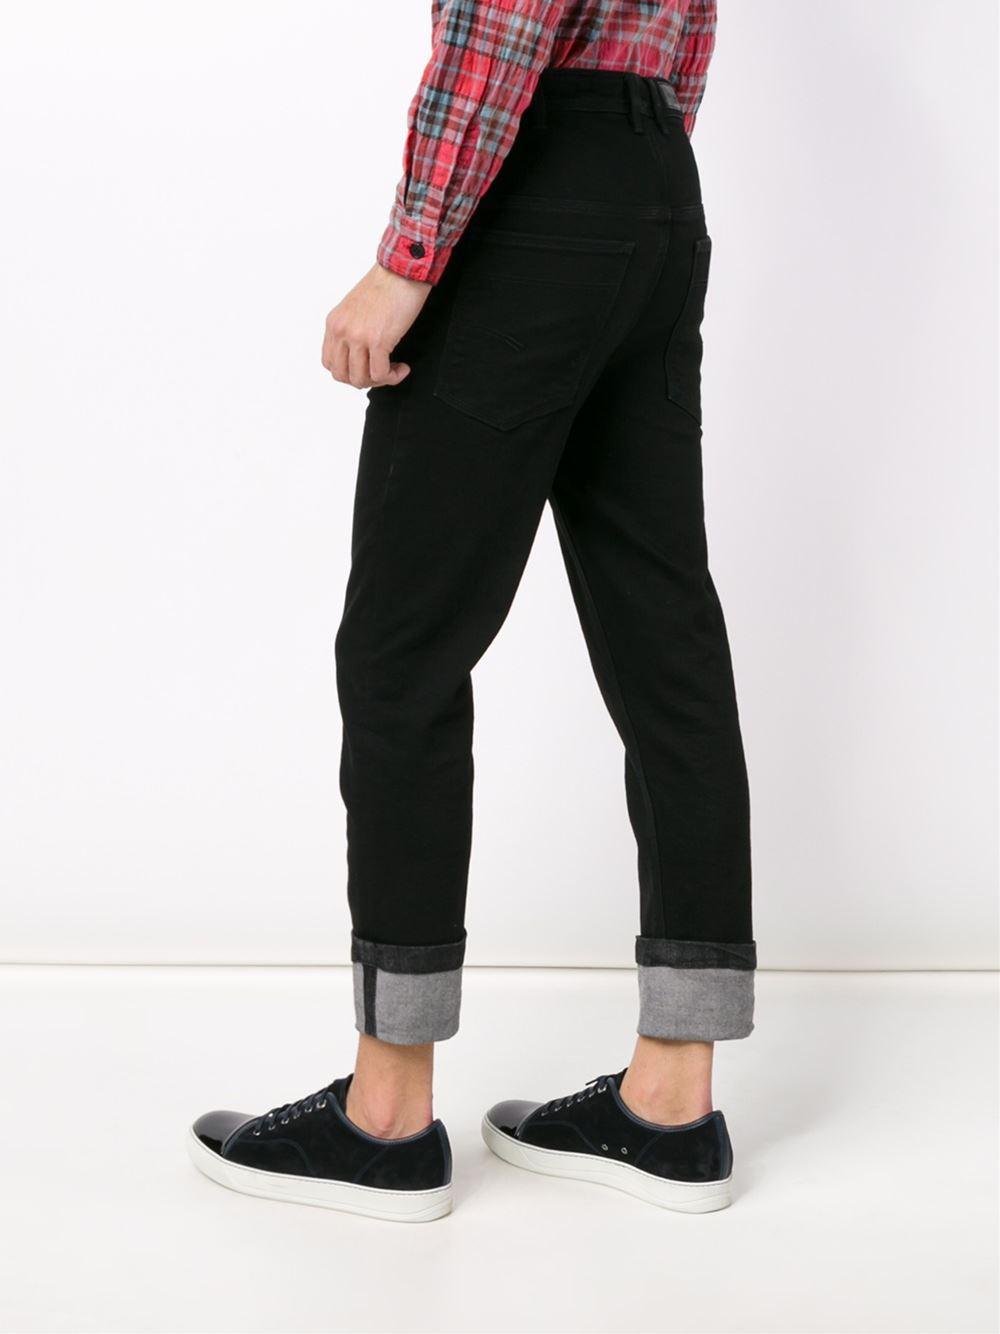 Neil Barrett Denim Cuffed Jeans in Black for Men